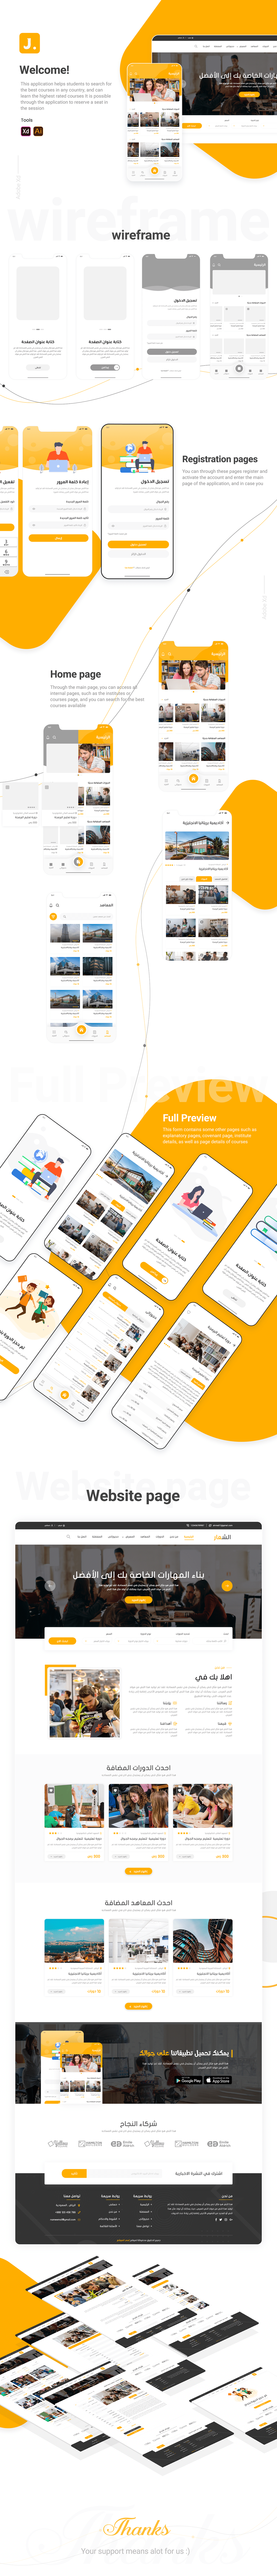 app application course designer Education Sokar UIdesigner uxui Web Website